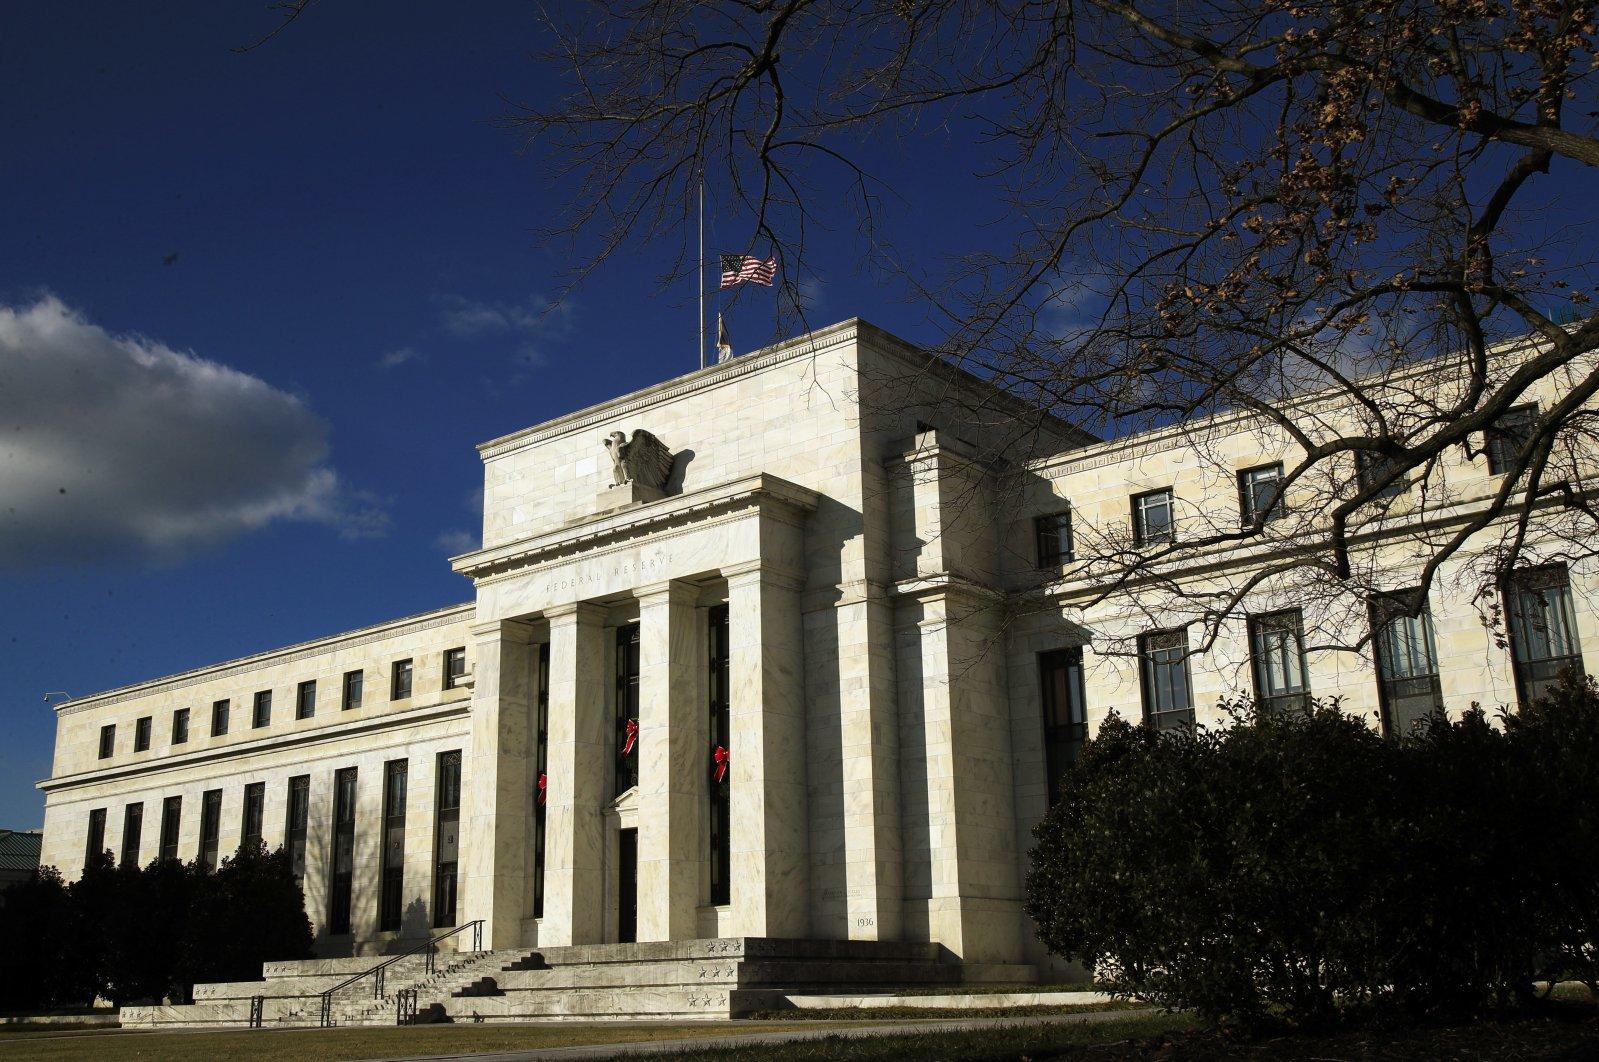 The Federal Reserve building in Washington, D.C., Dec. 24, 2018. (AP Photo)